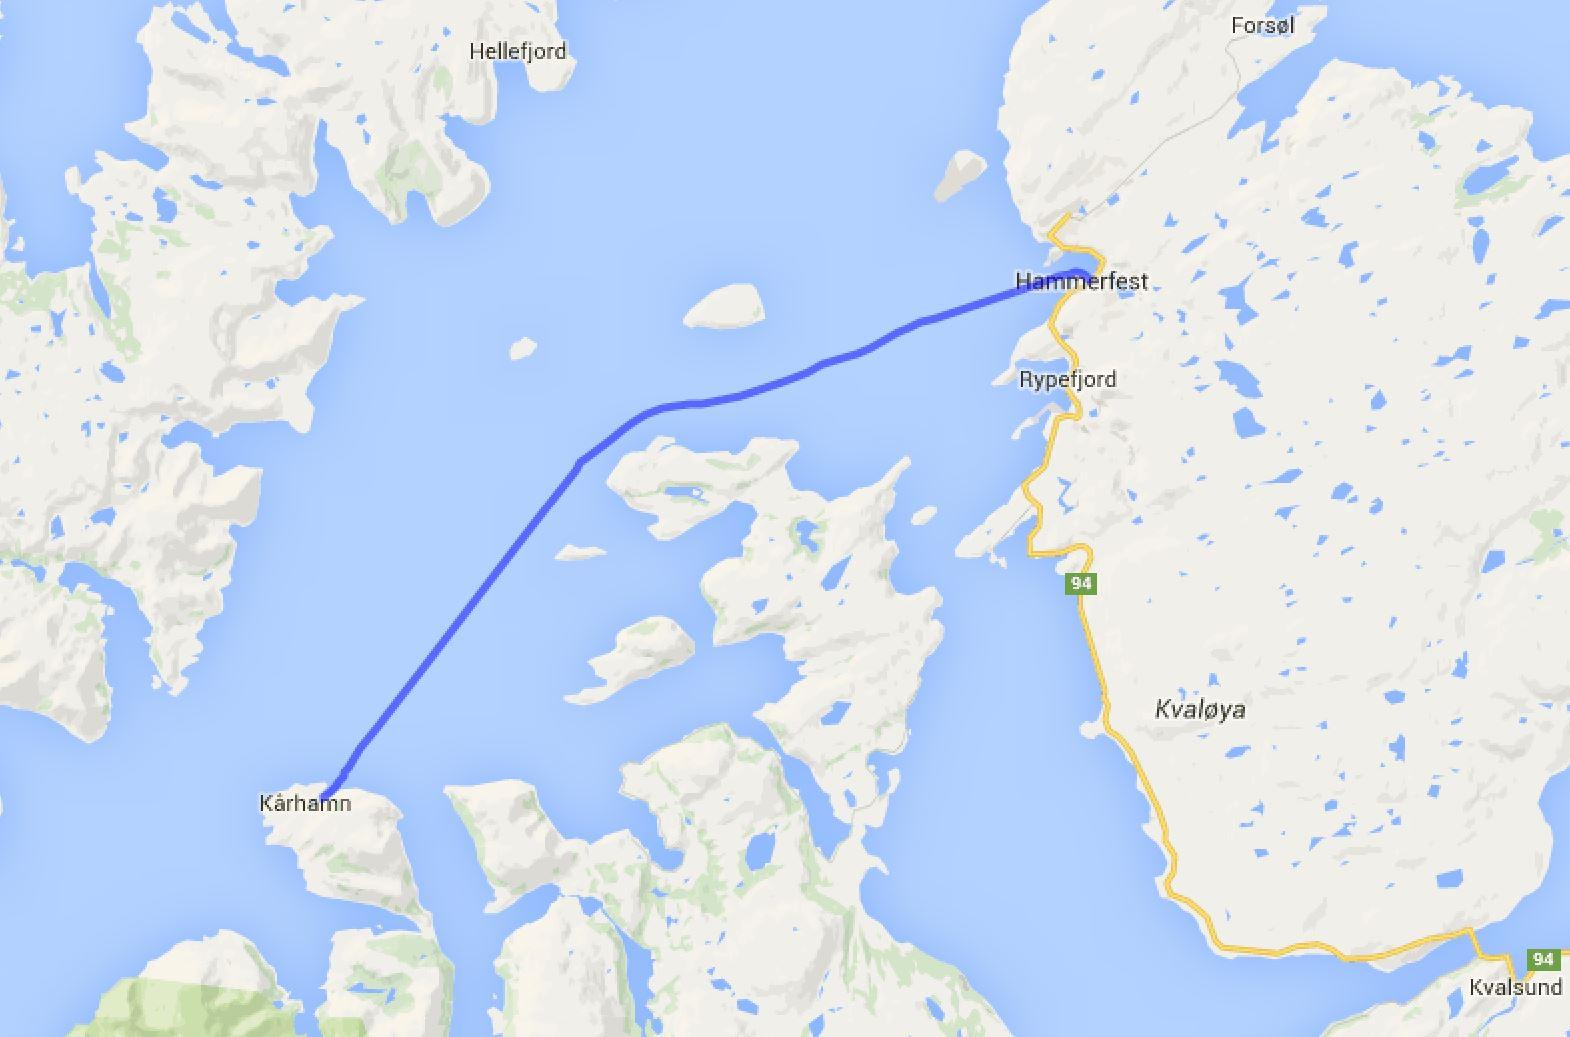 Karhamn - Hammerfest